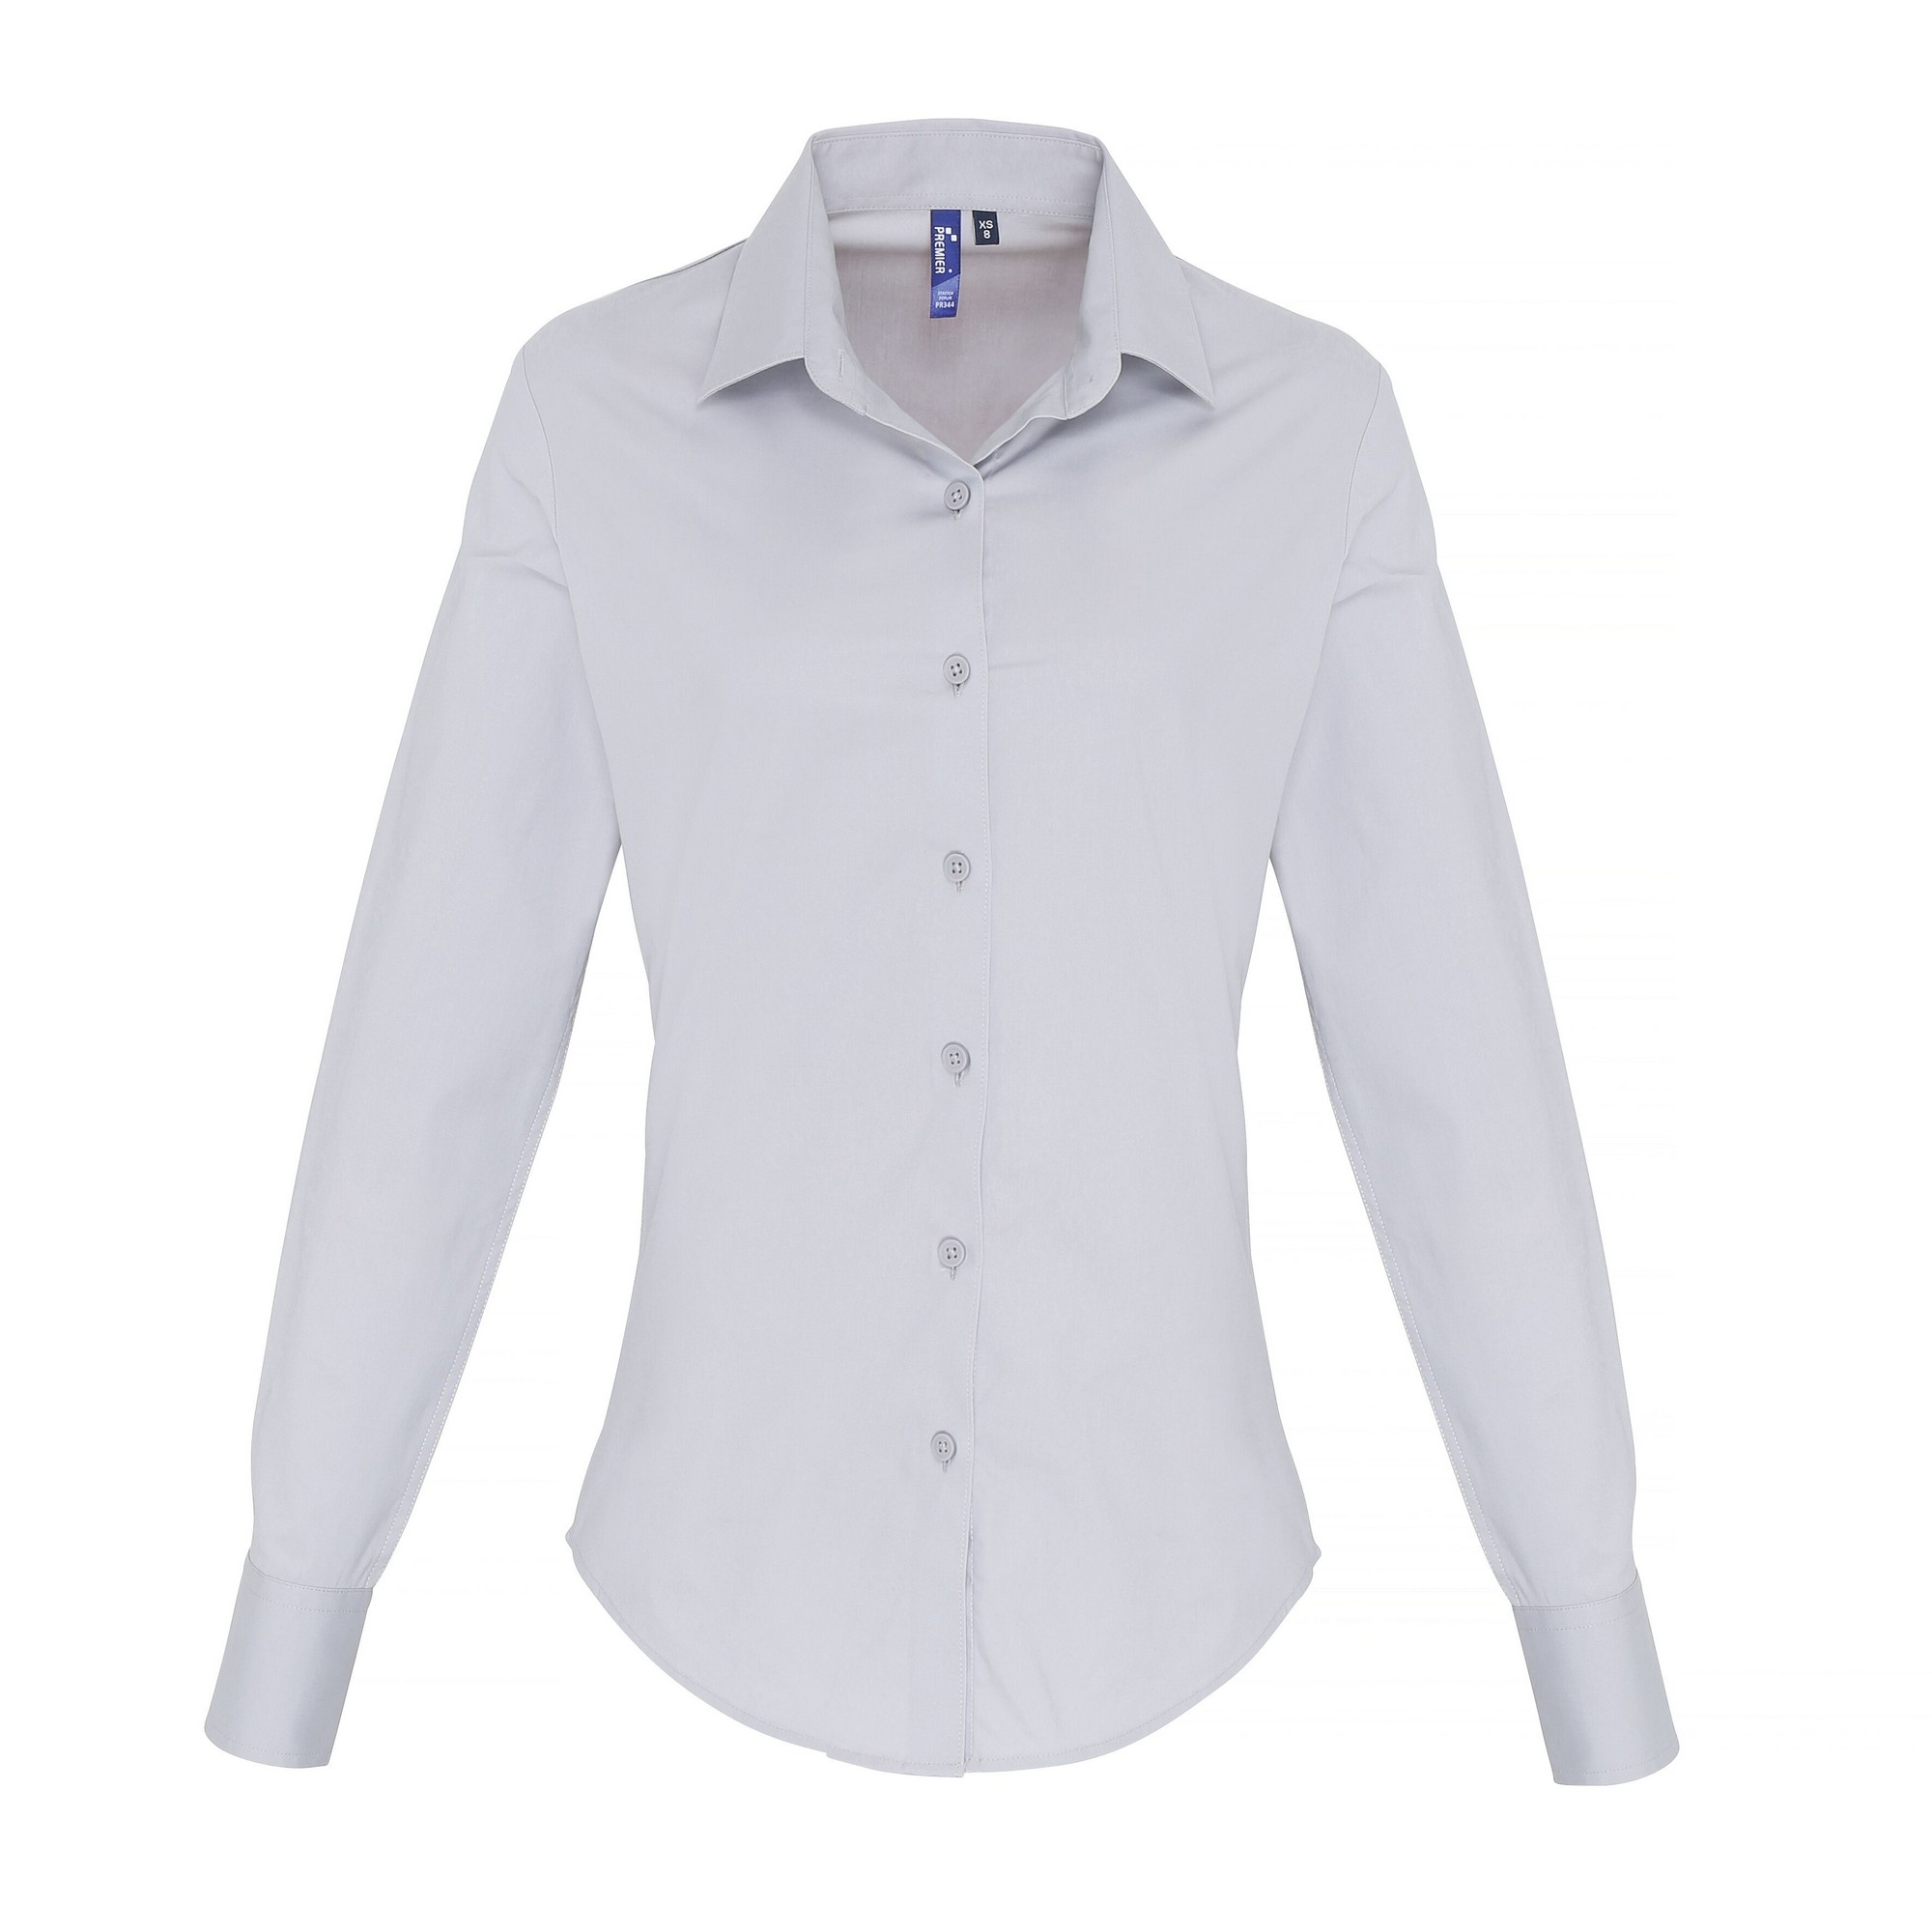 Premier Womens/Ladies Stretch Fit Poplin Long Sleeve Blouse (XS) (Silver)